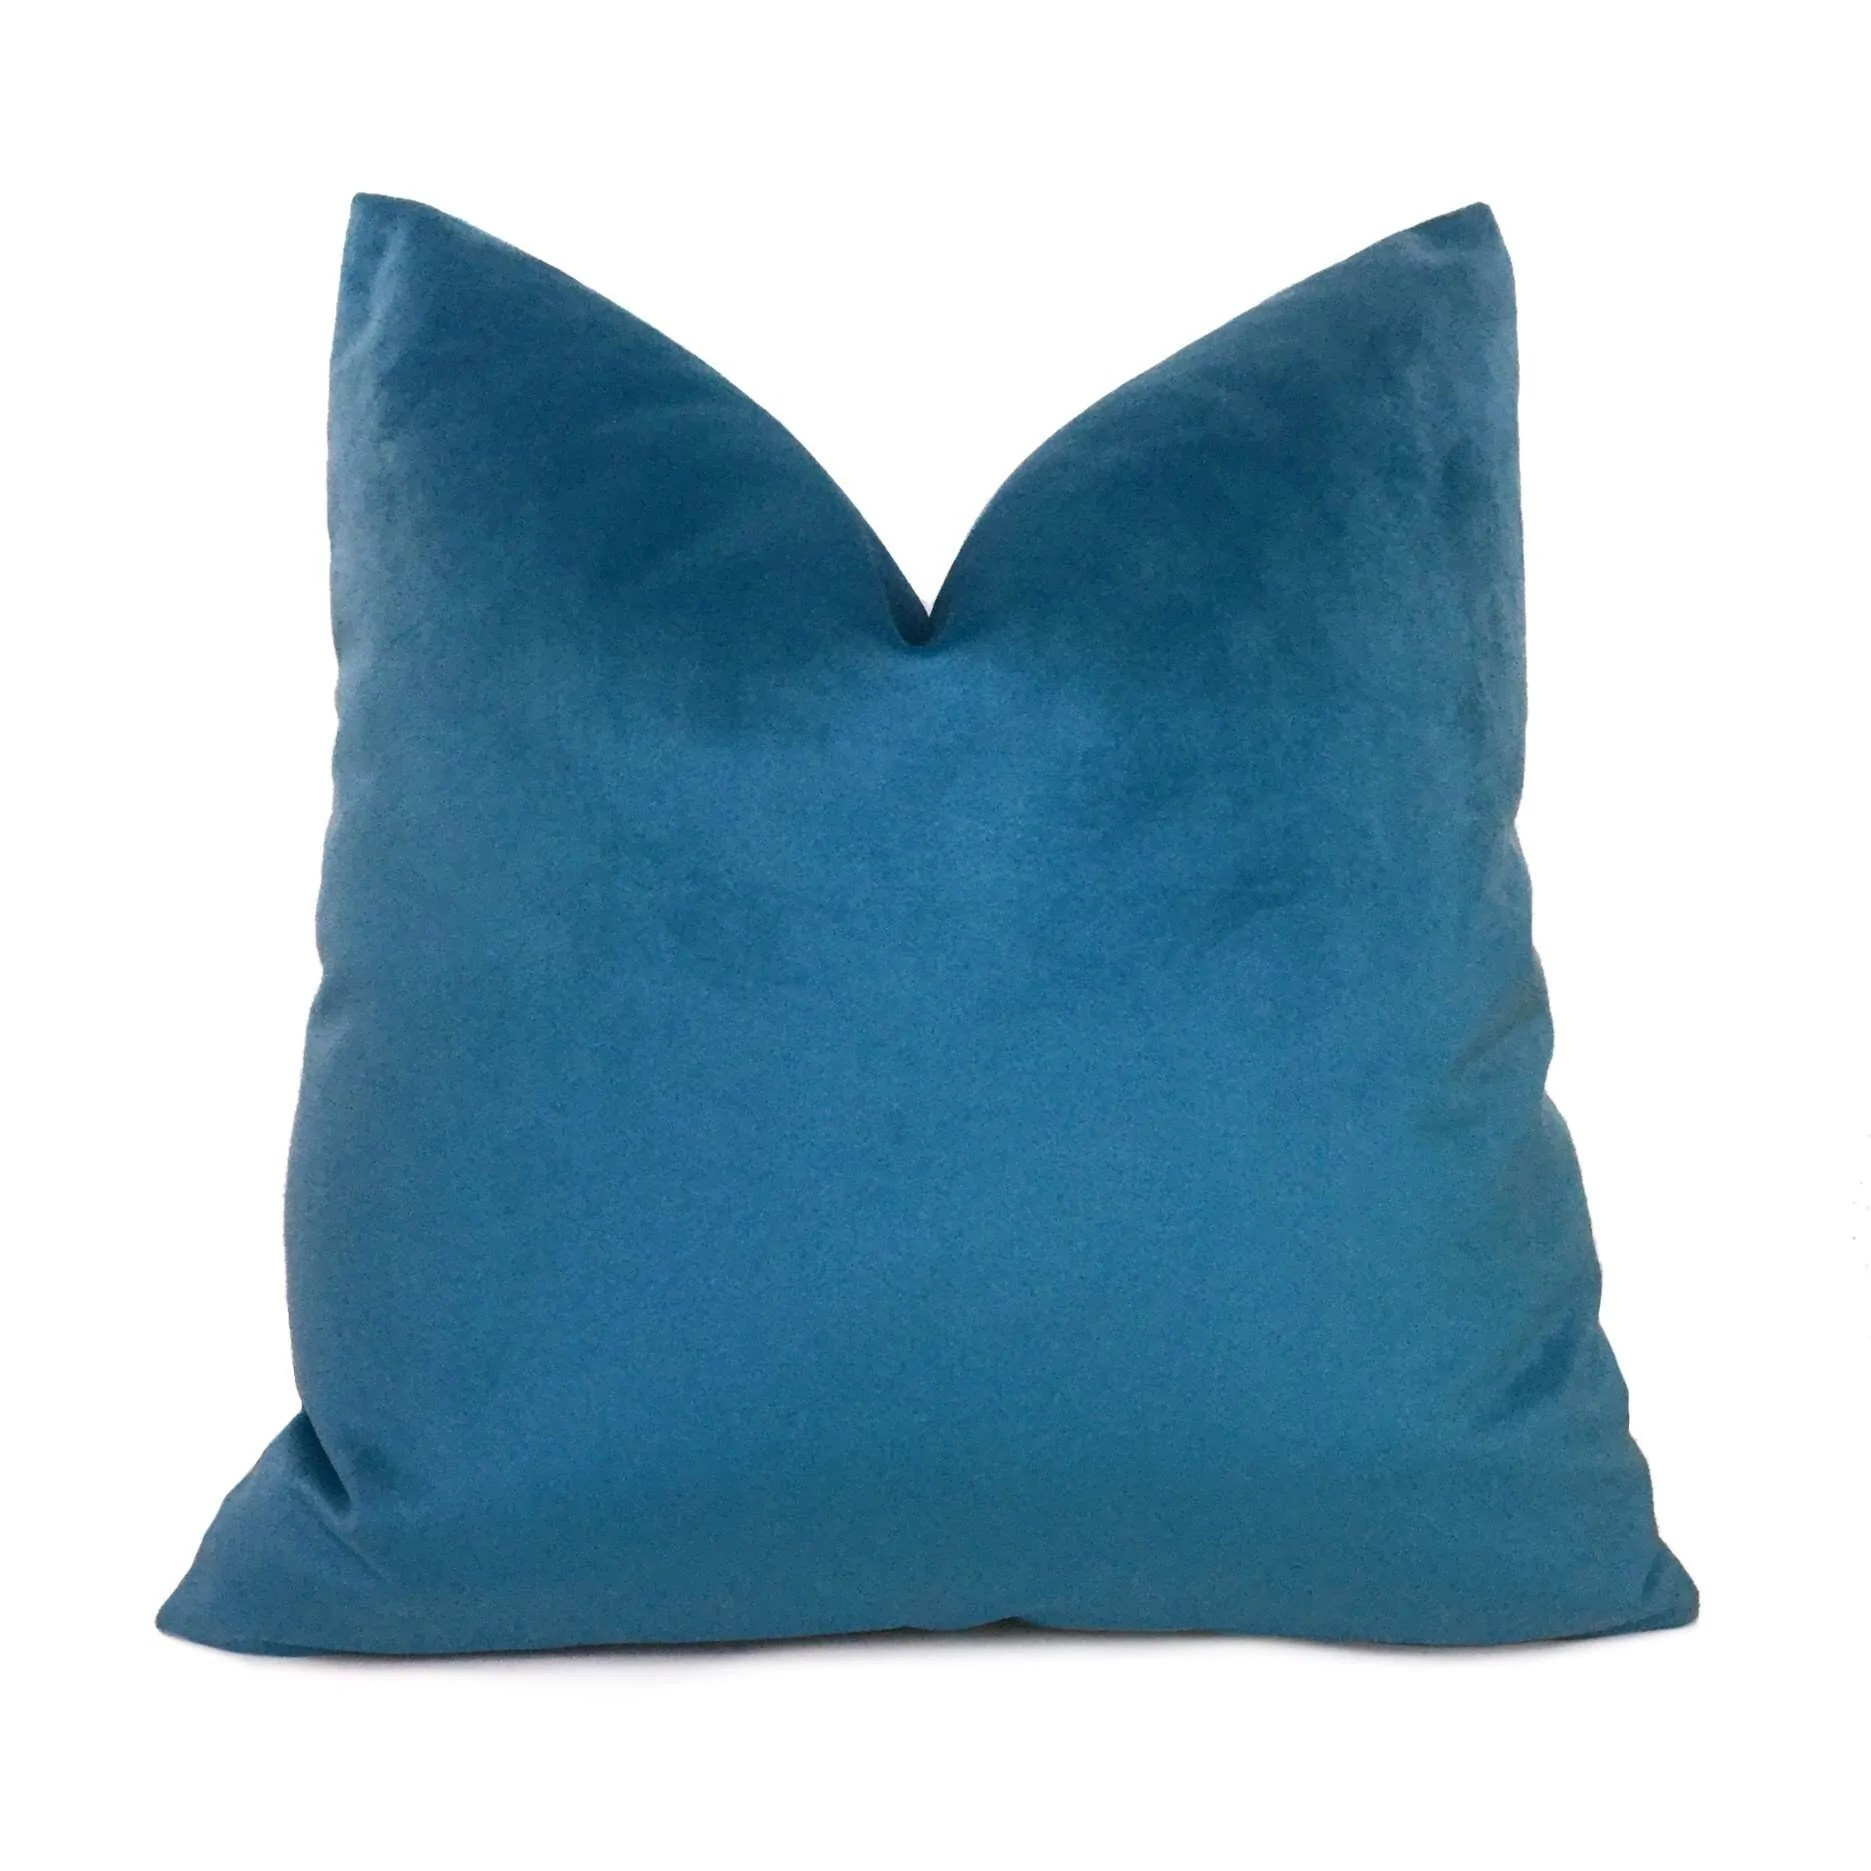 solid capri blue libretto microfiber velvet pillow cover